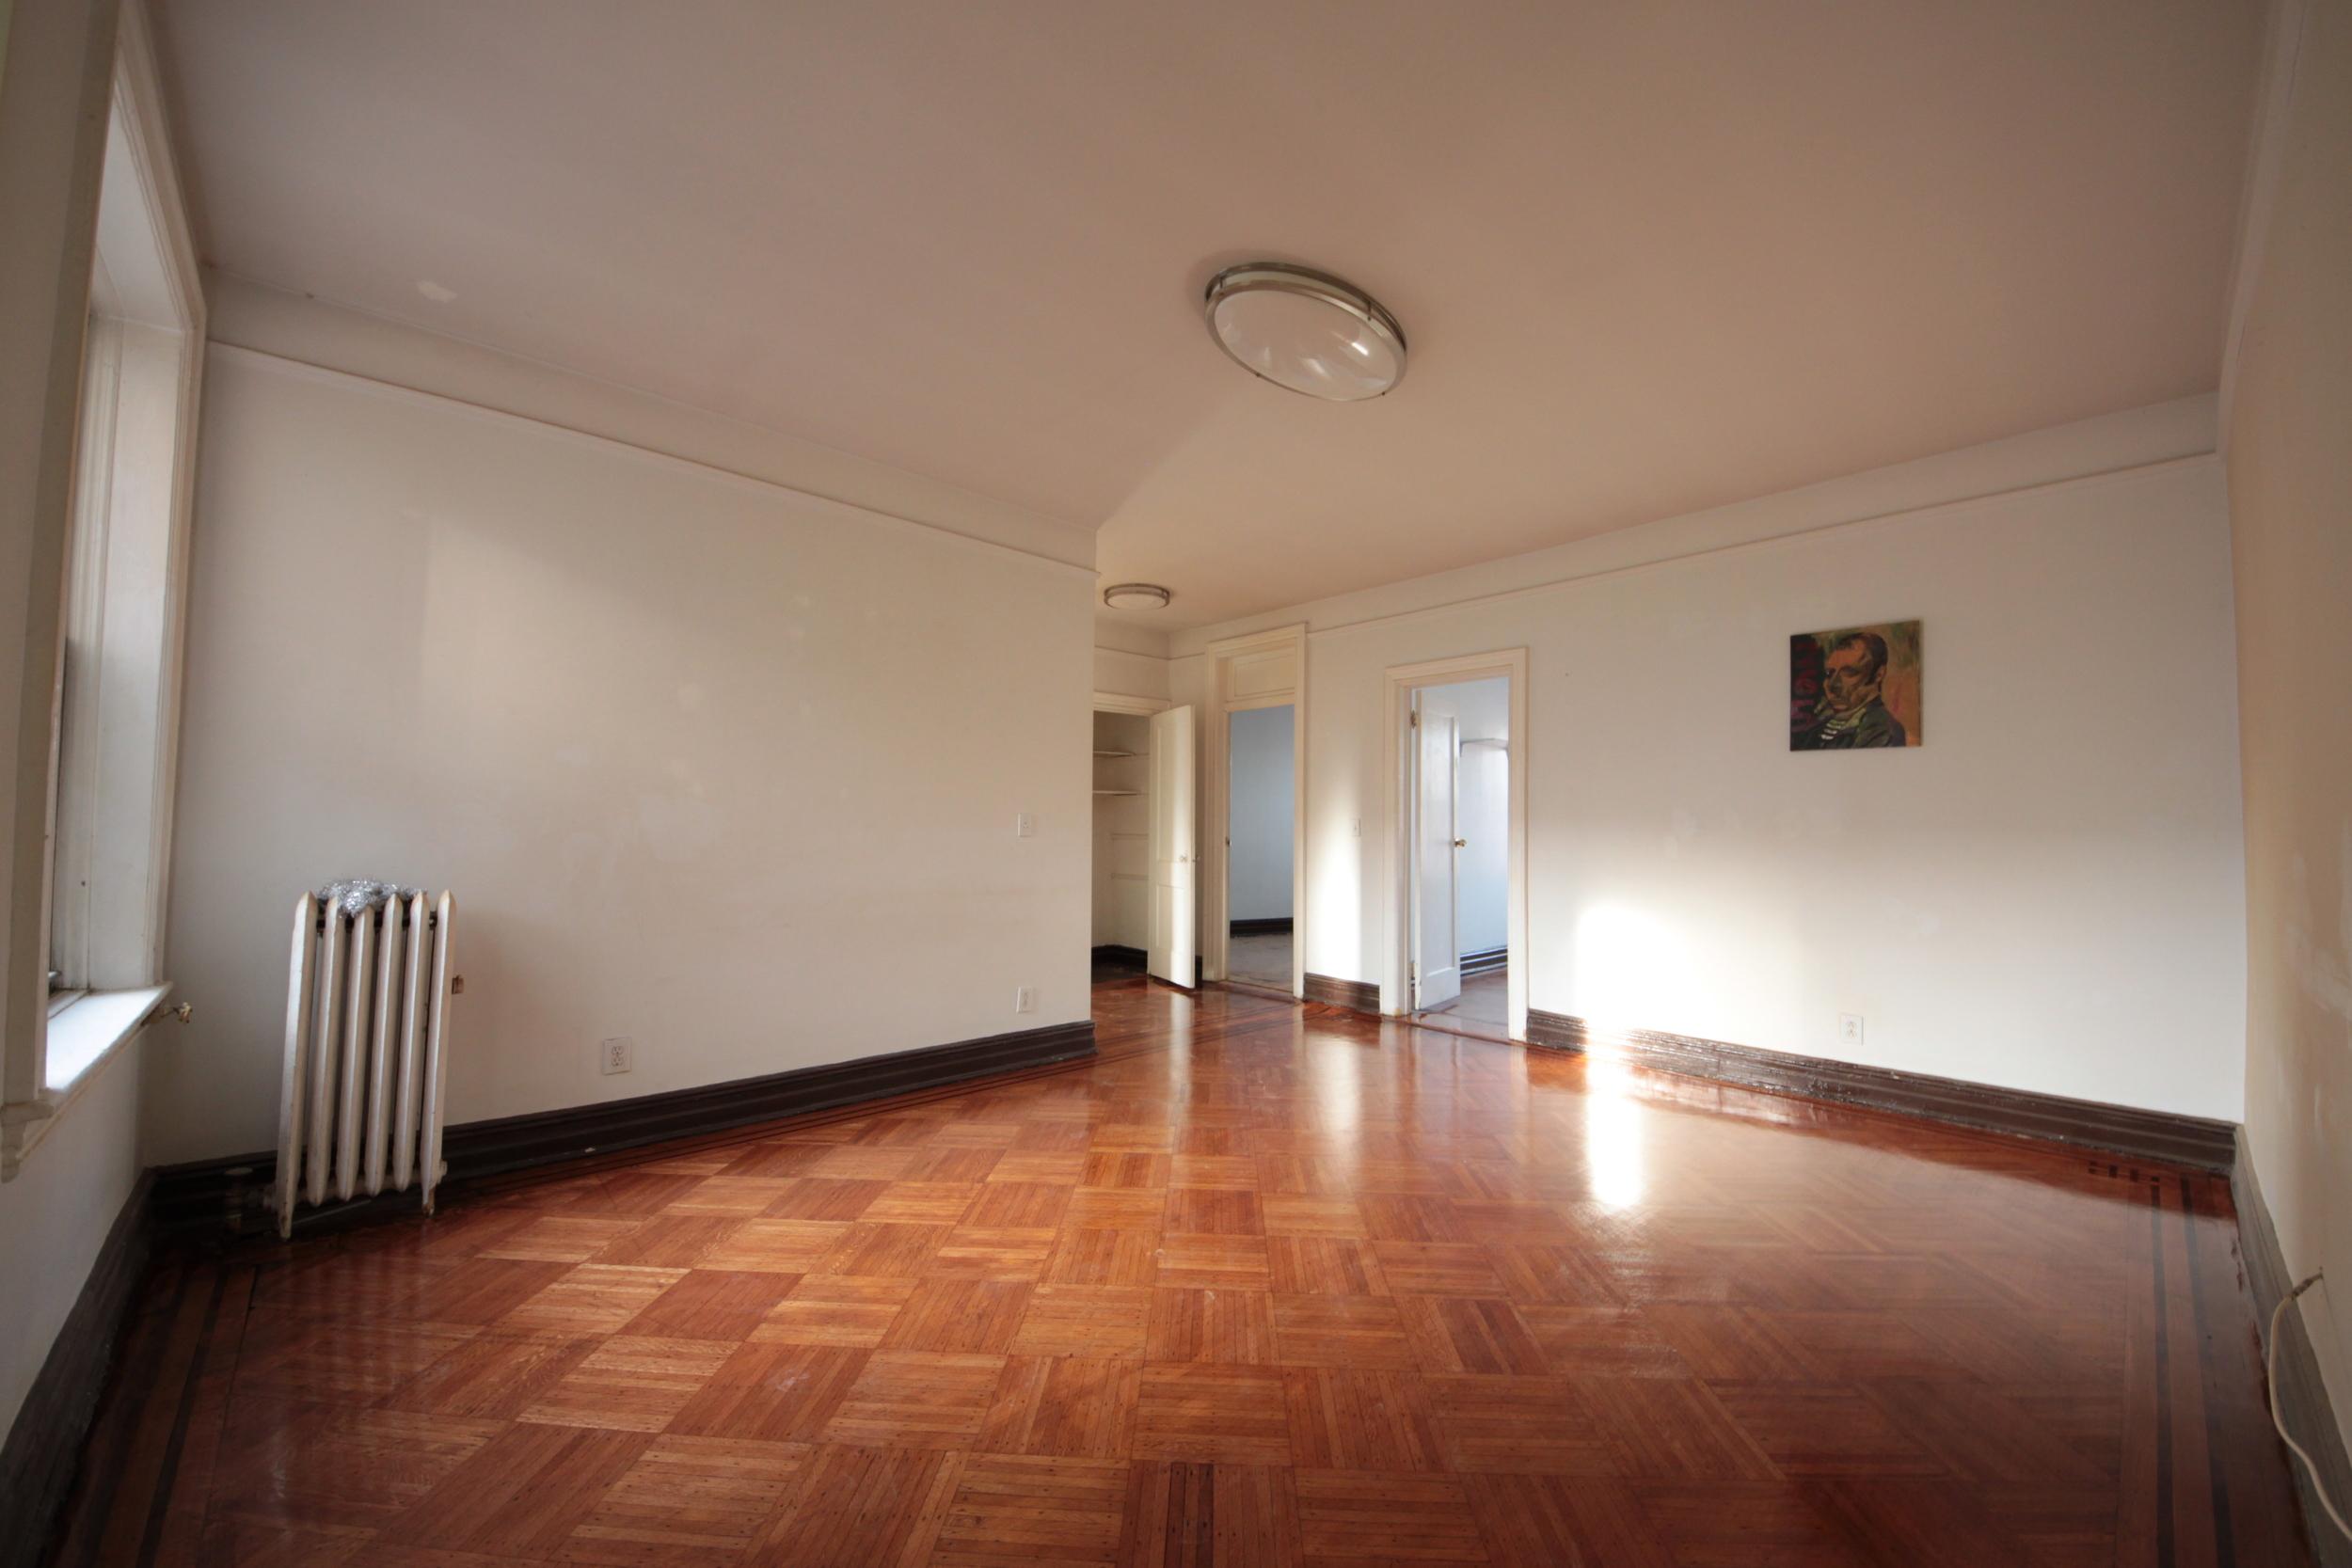 265 4th Ave, Apt 5 - 3 Bed/1 Bath in Park SlopeRENTED - $3300/month